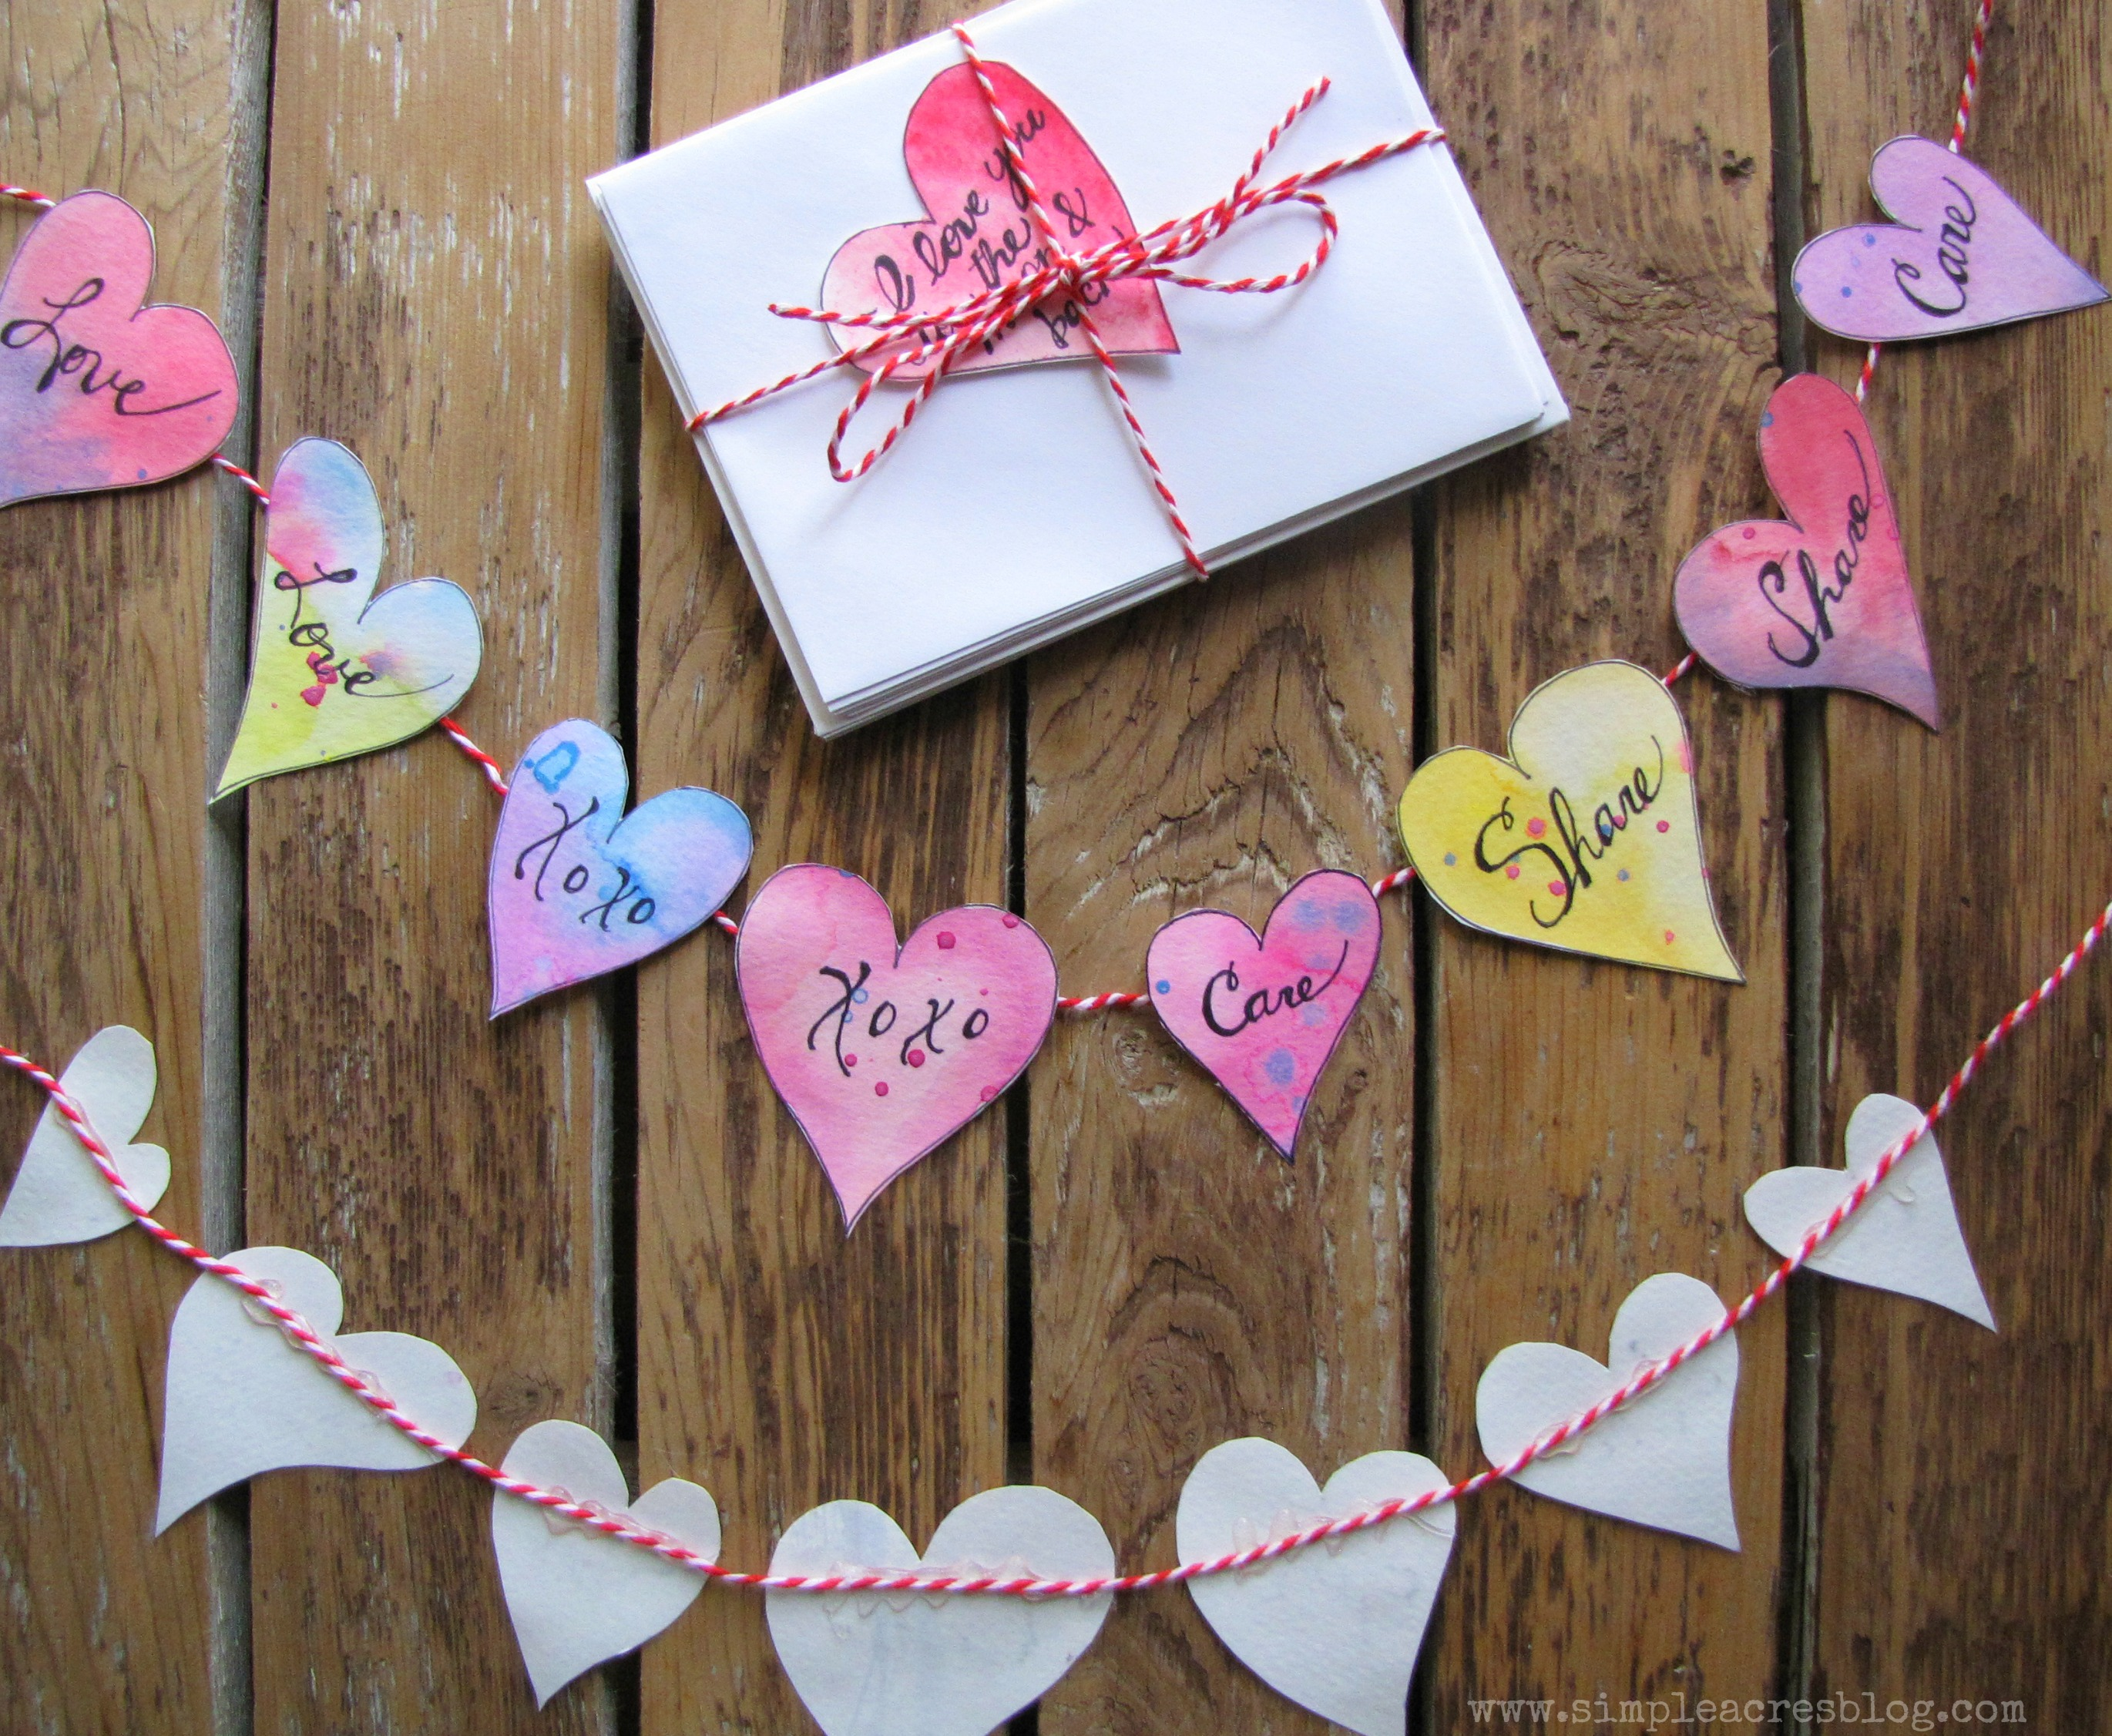 Handmade valentines to unite family.